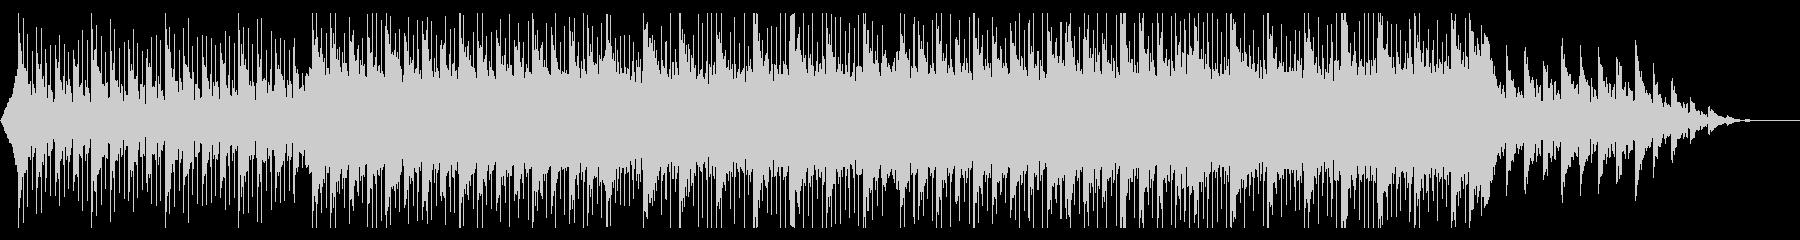 bgm36の未再生の波形